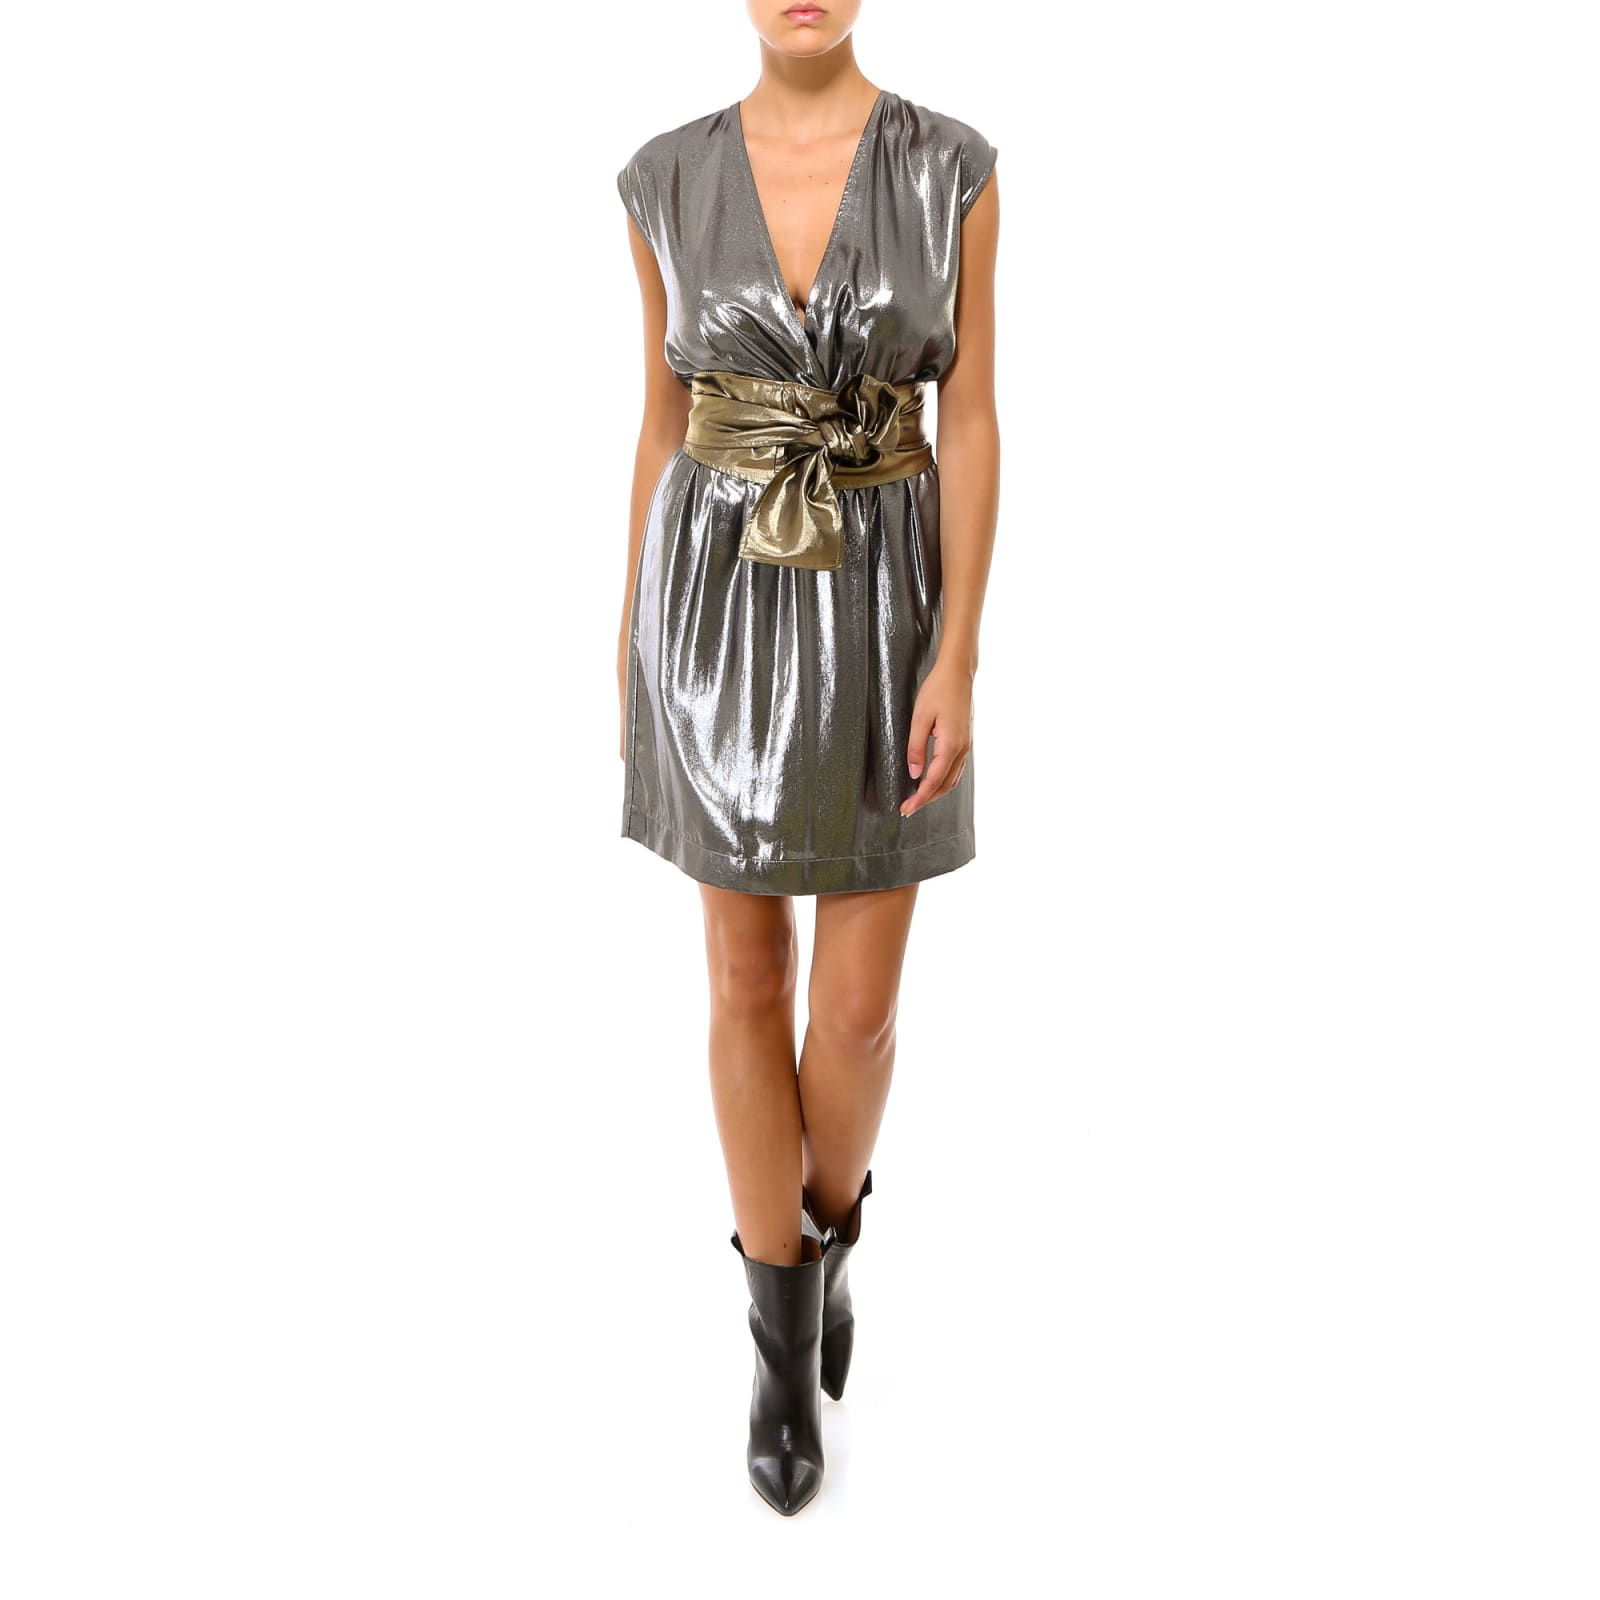 8PM Dress